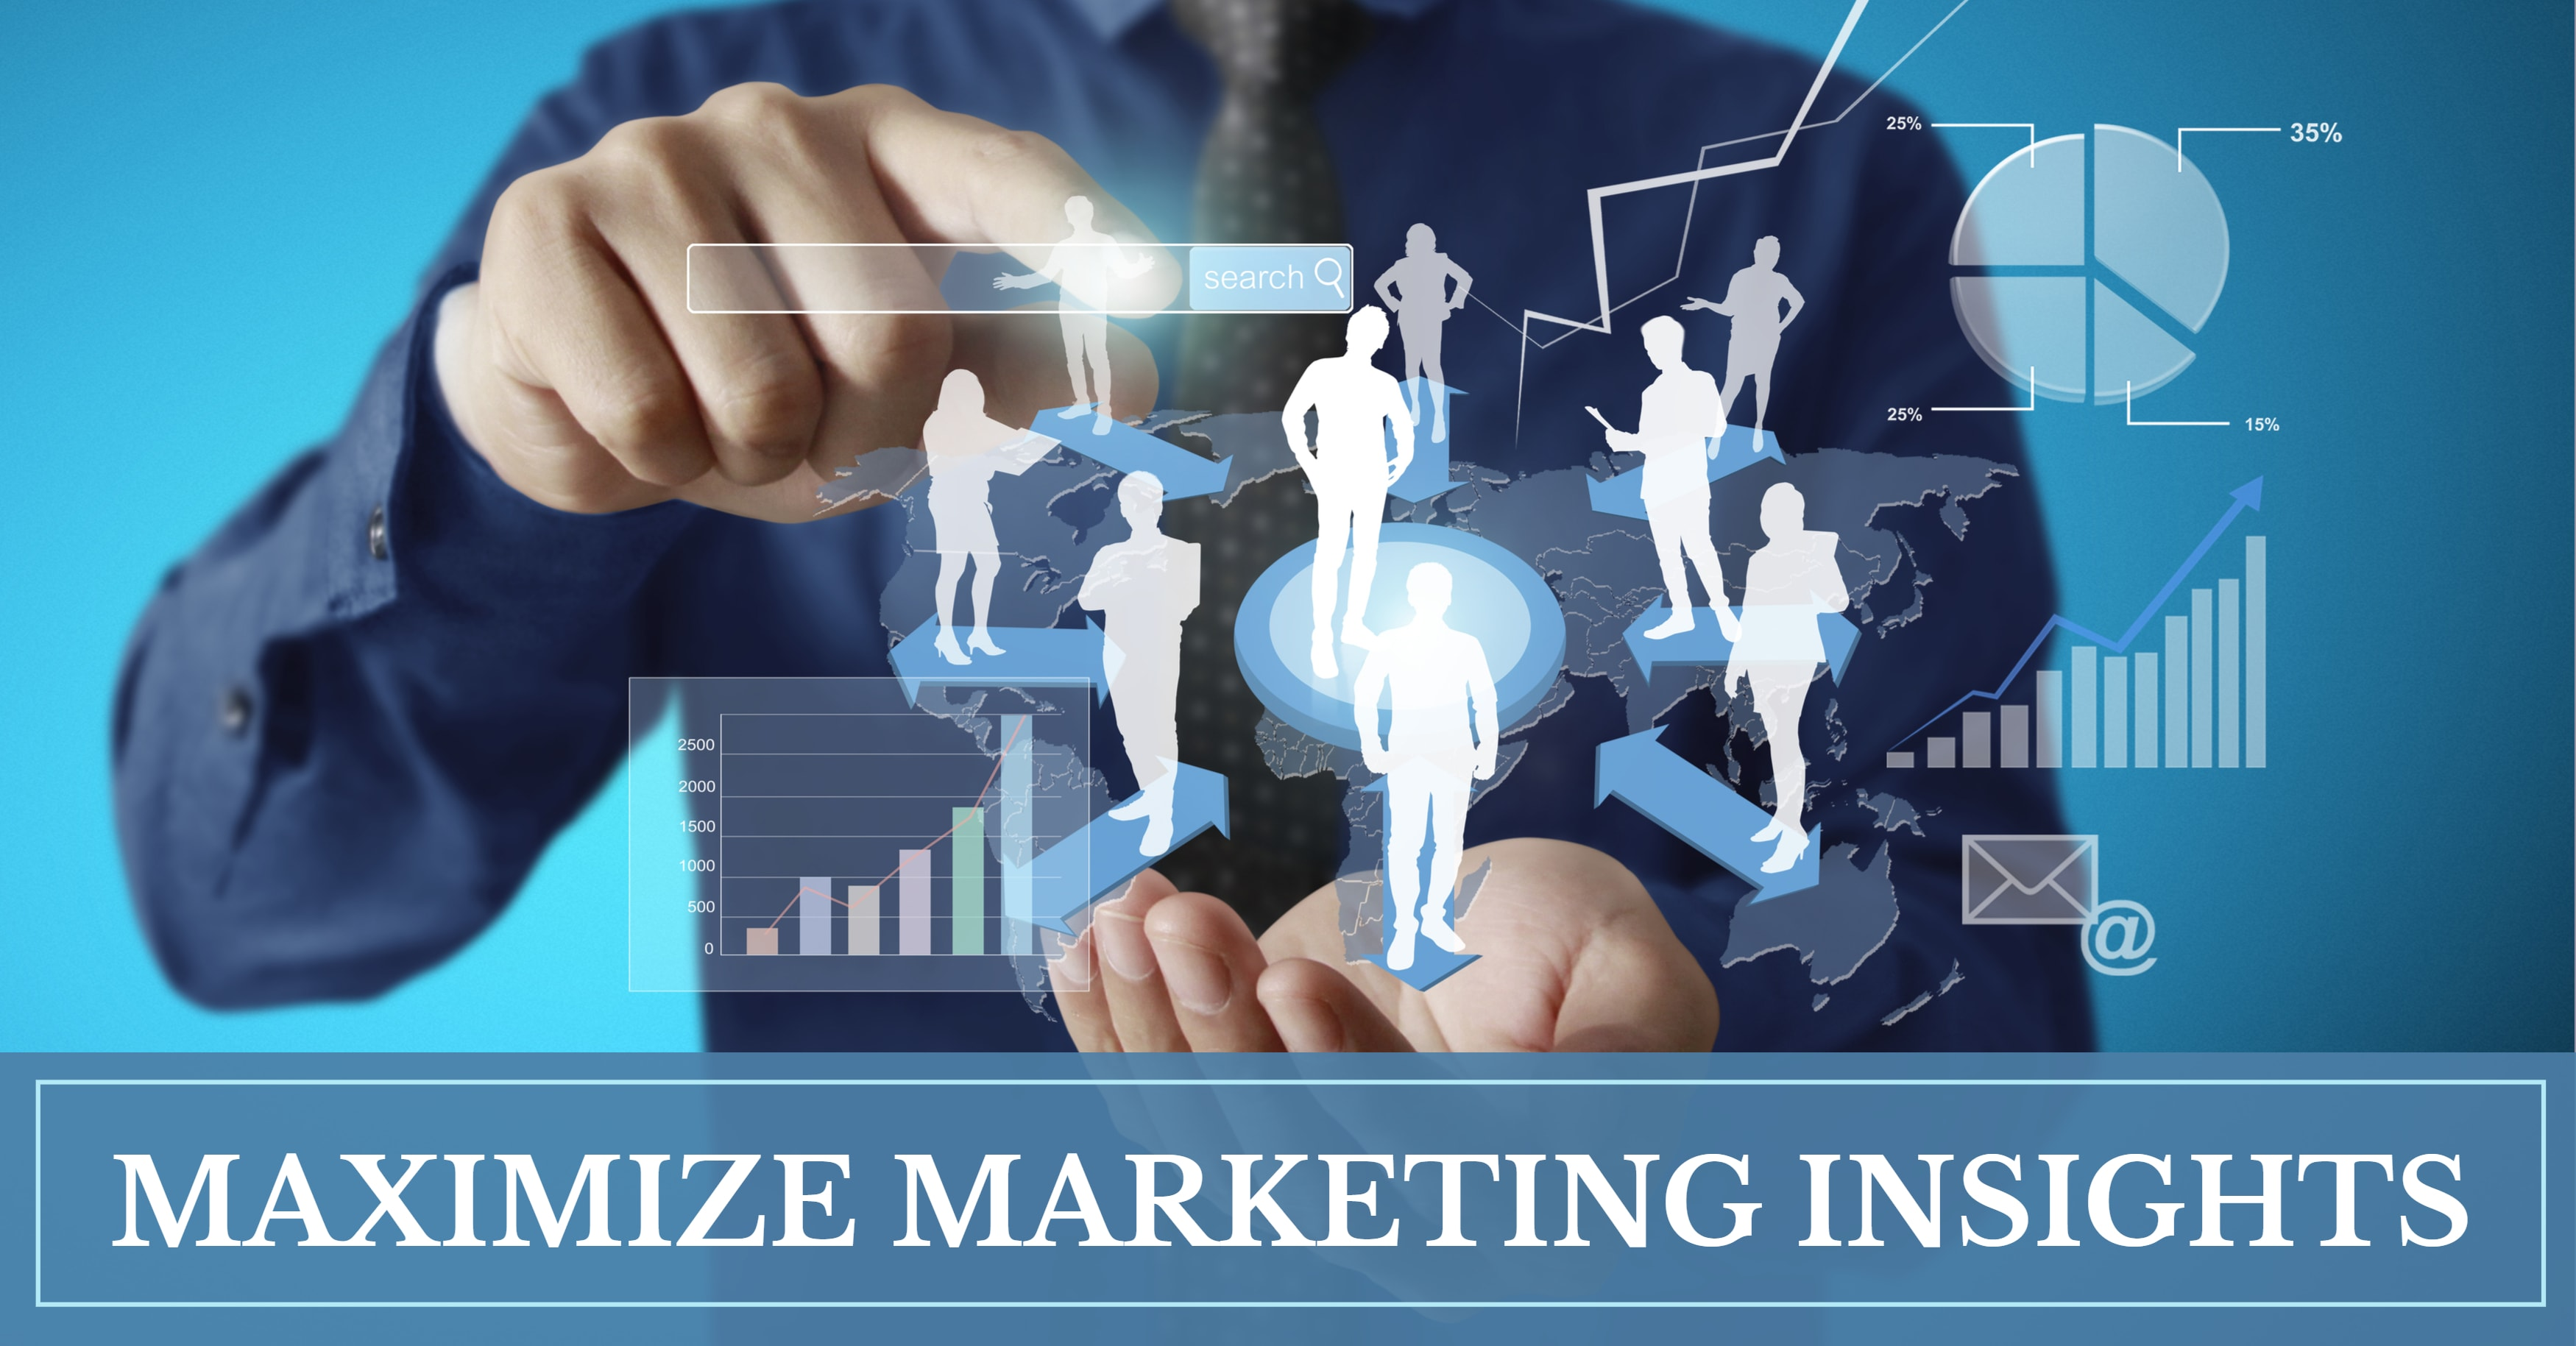 How to Maximize Marketing Insights